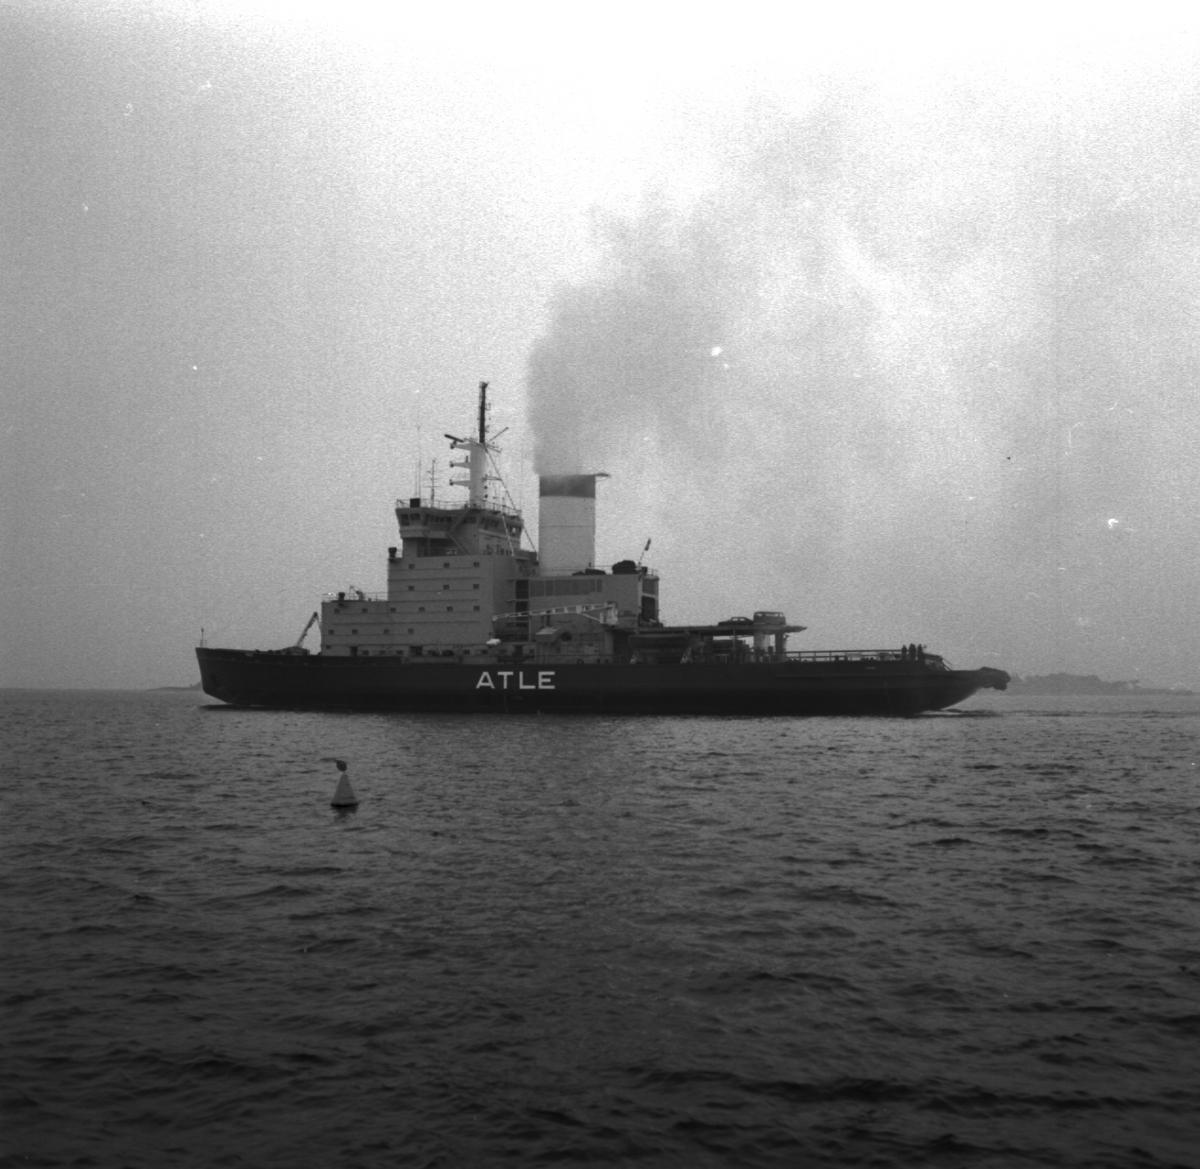 Fartyg: ATLE                            Övrigt: Isbrytaren Atle lämnar varvet.